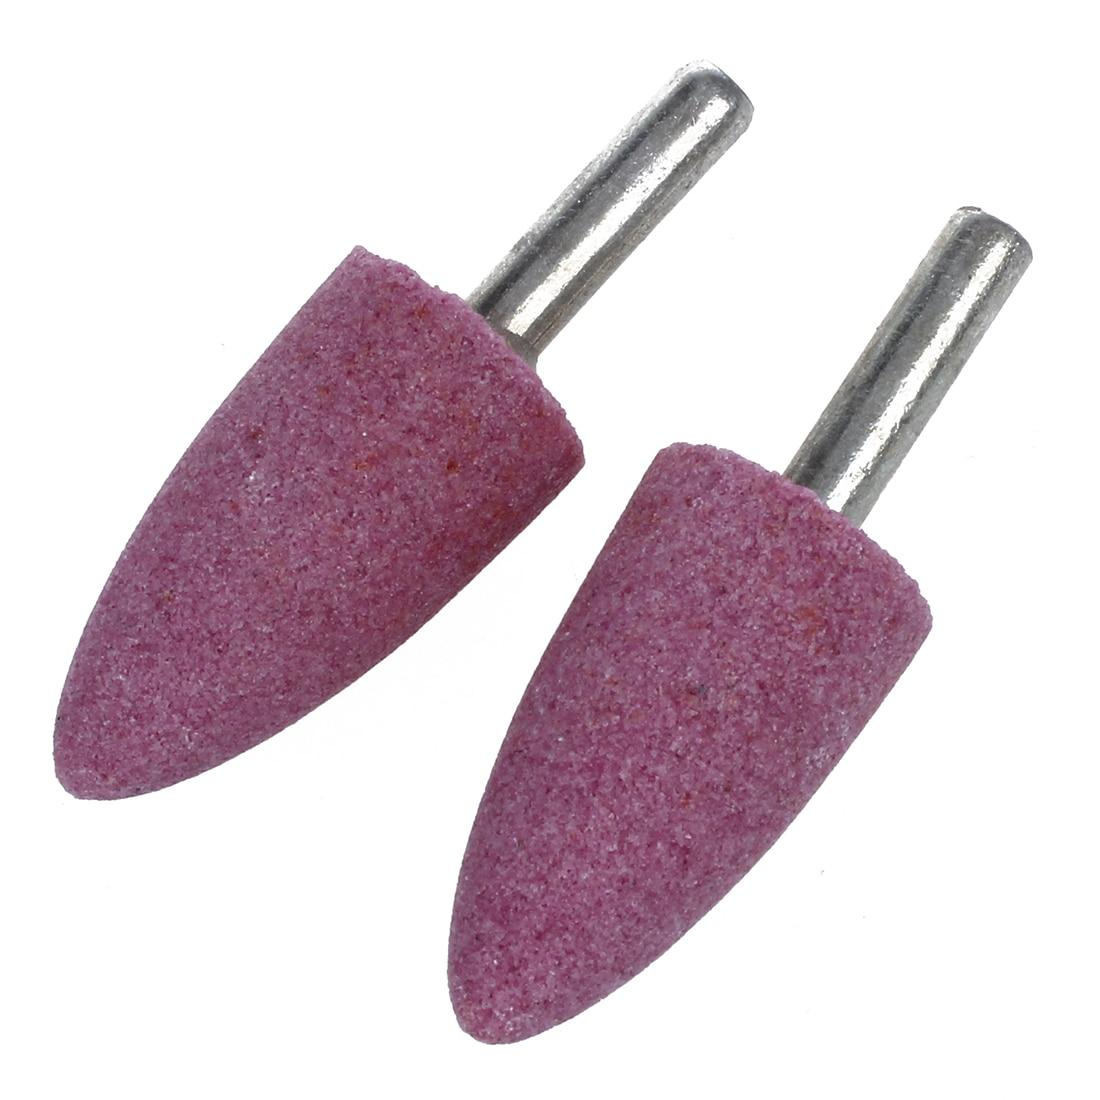 NFLC-19mm Head Ceramic Stone Abrasive Grinding Mounted Points 2 Pcs